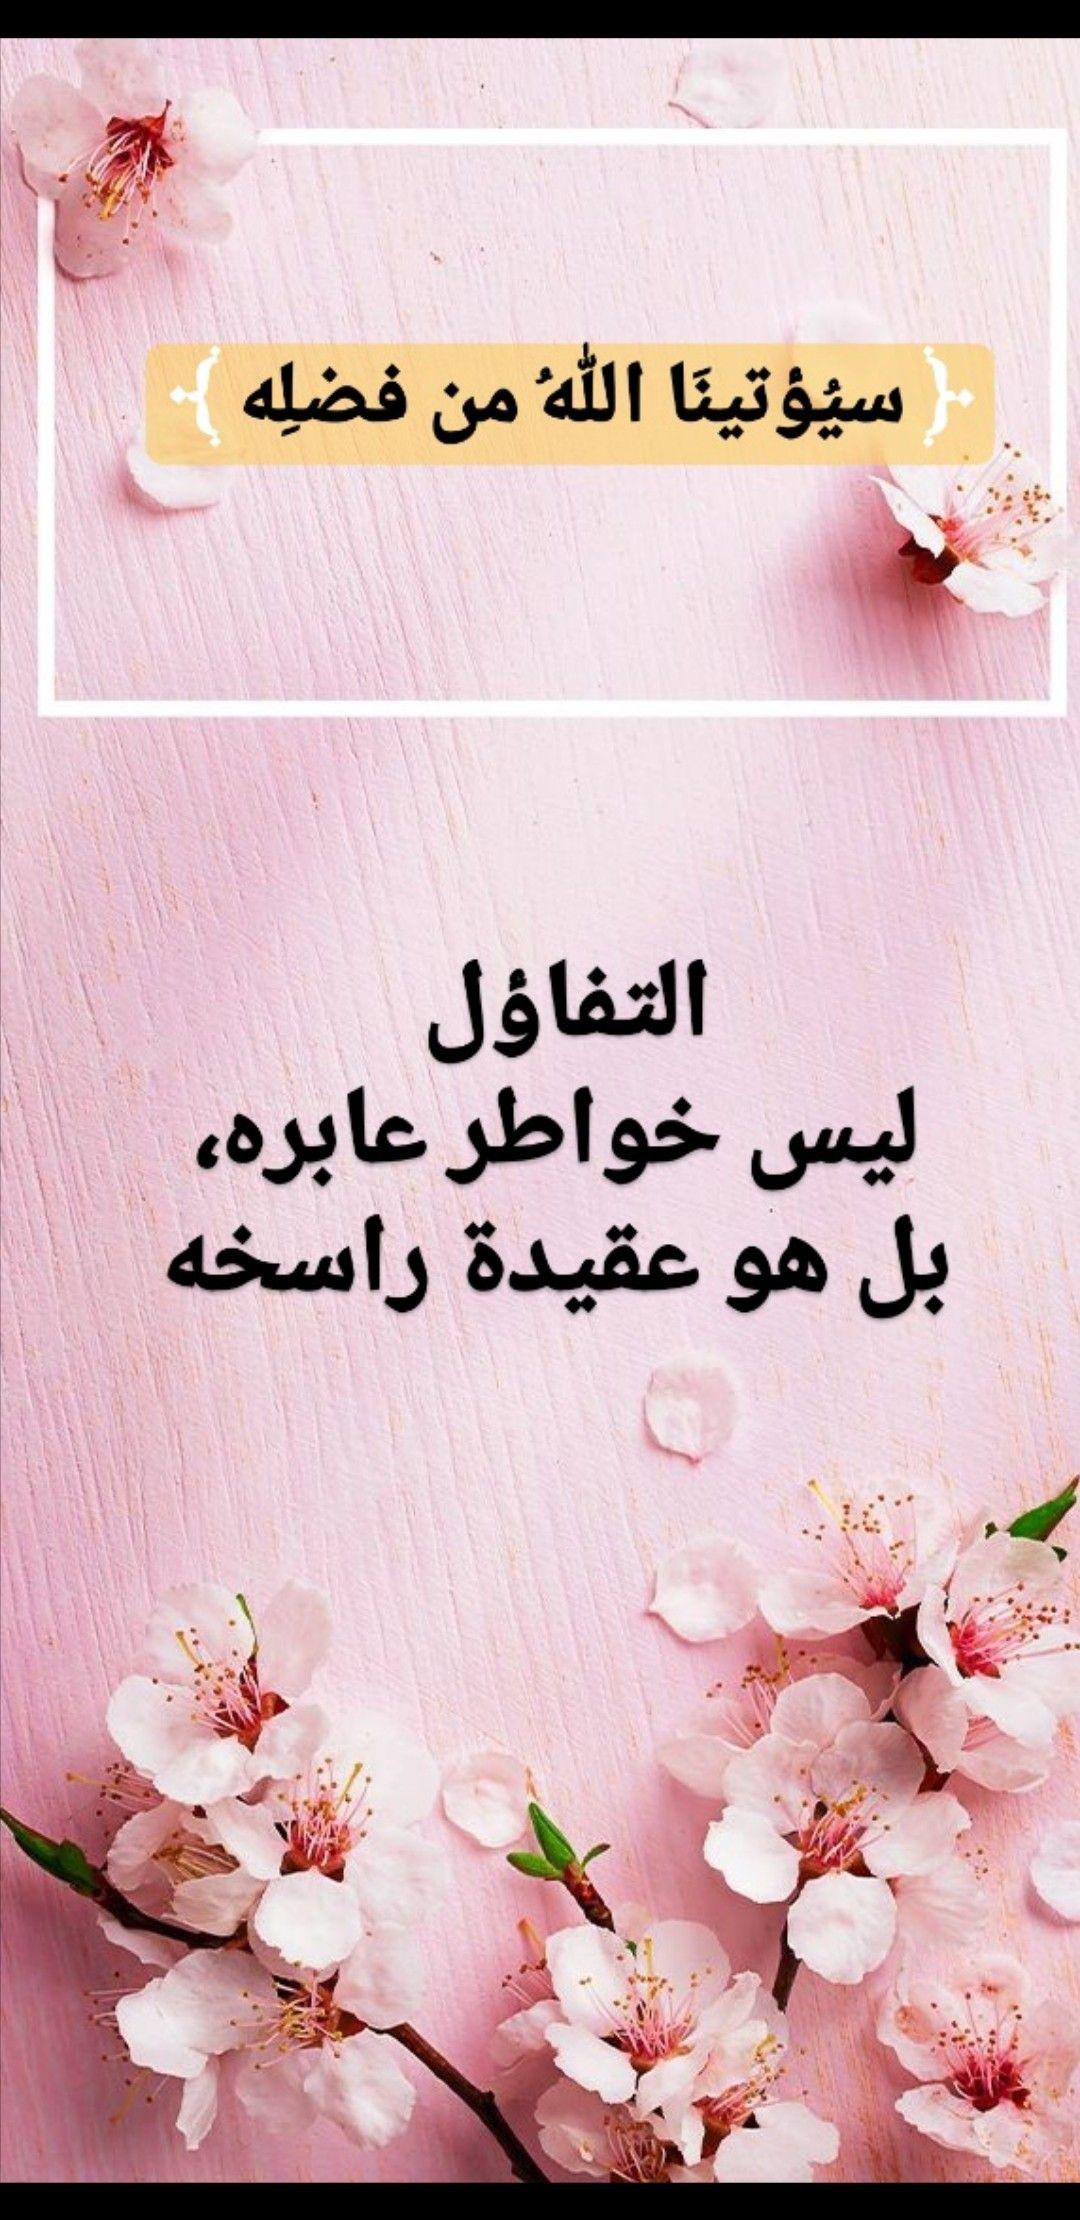 Pin On مع الله ولله والي الله